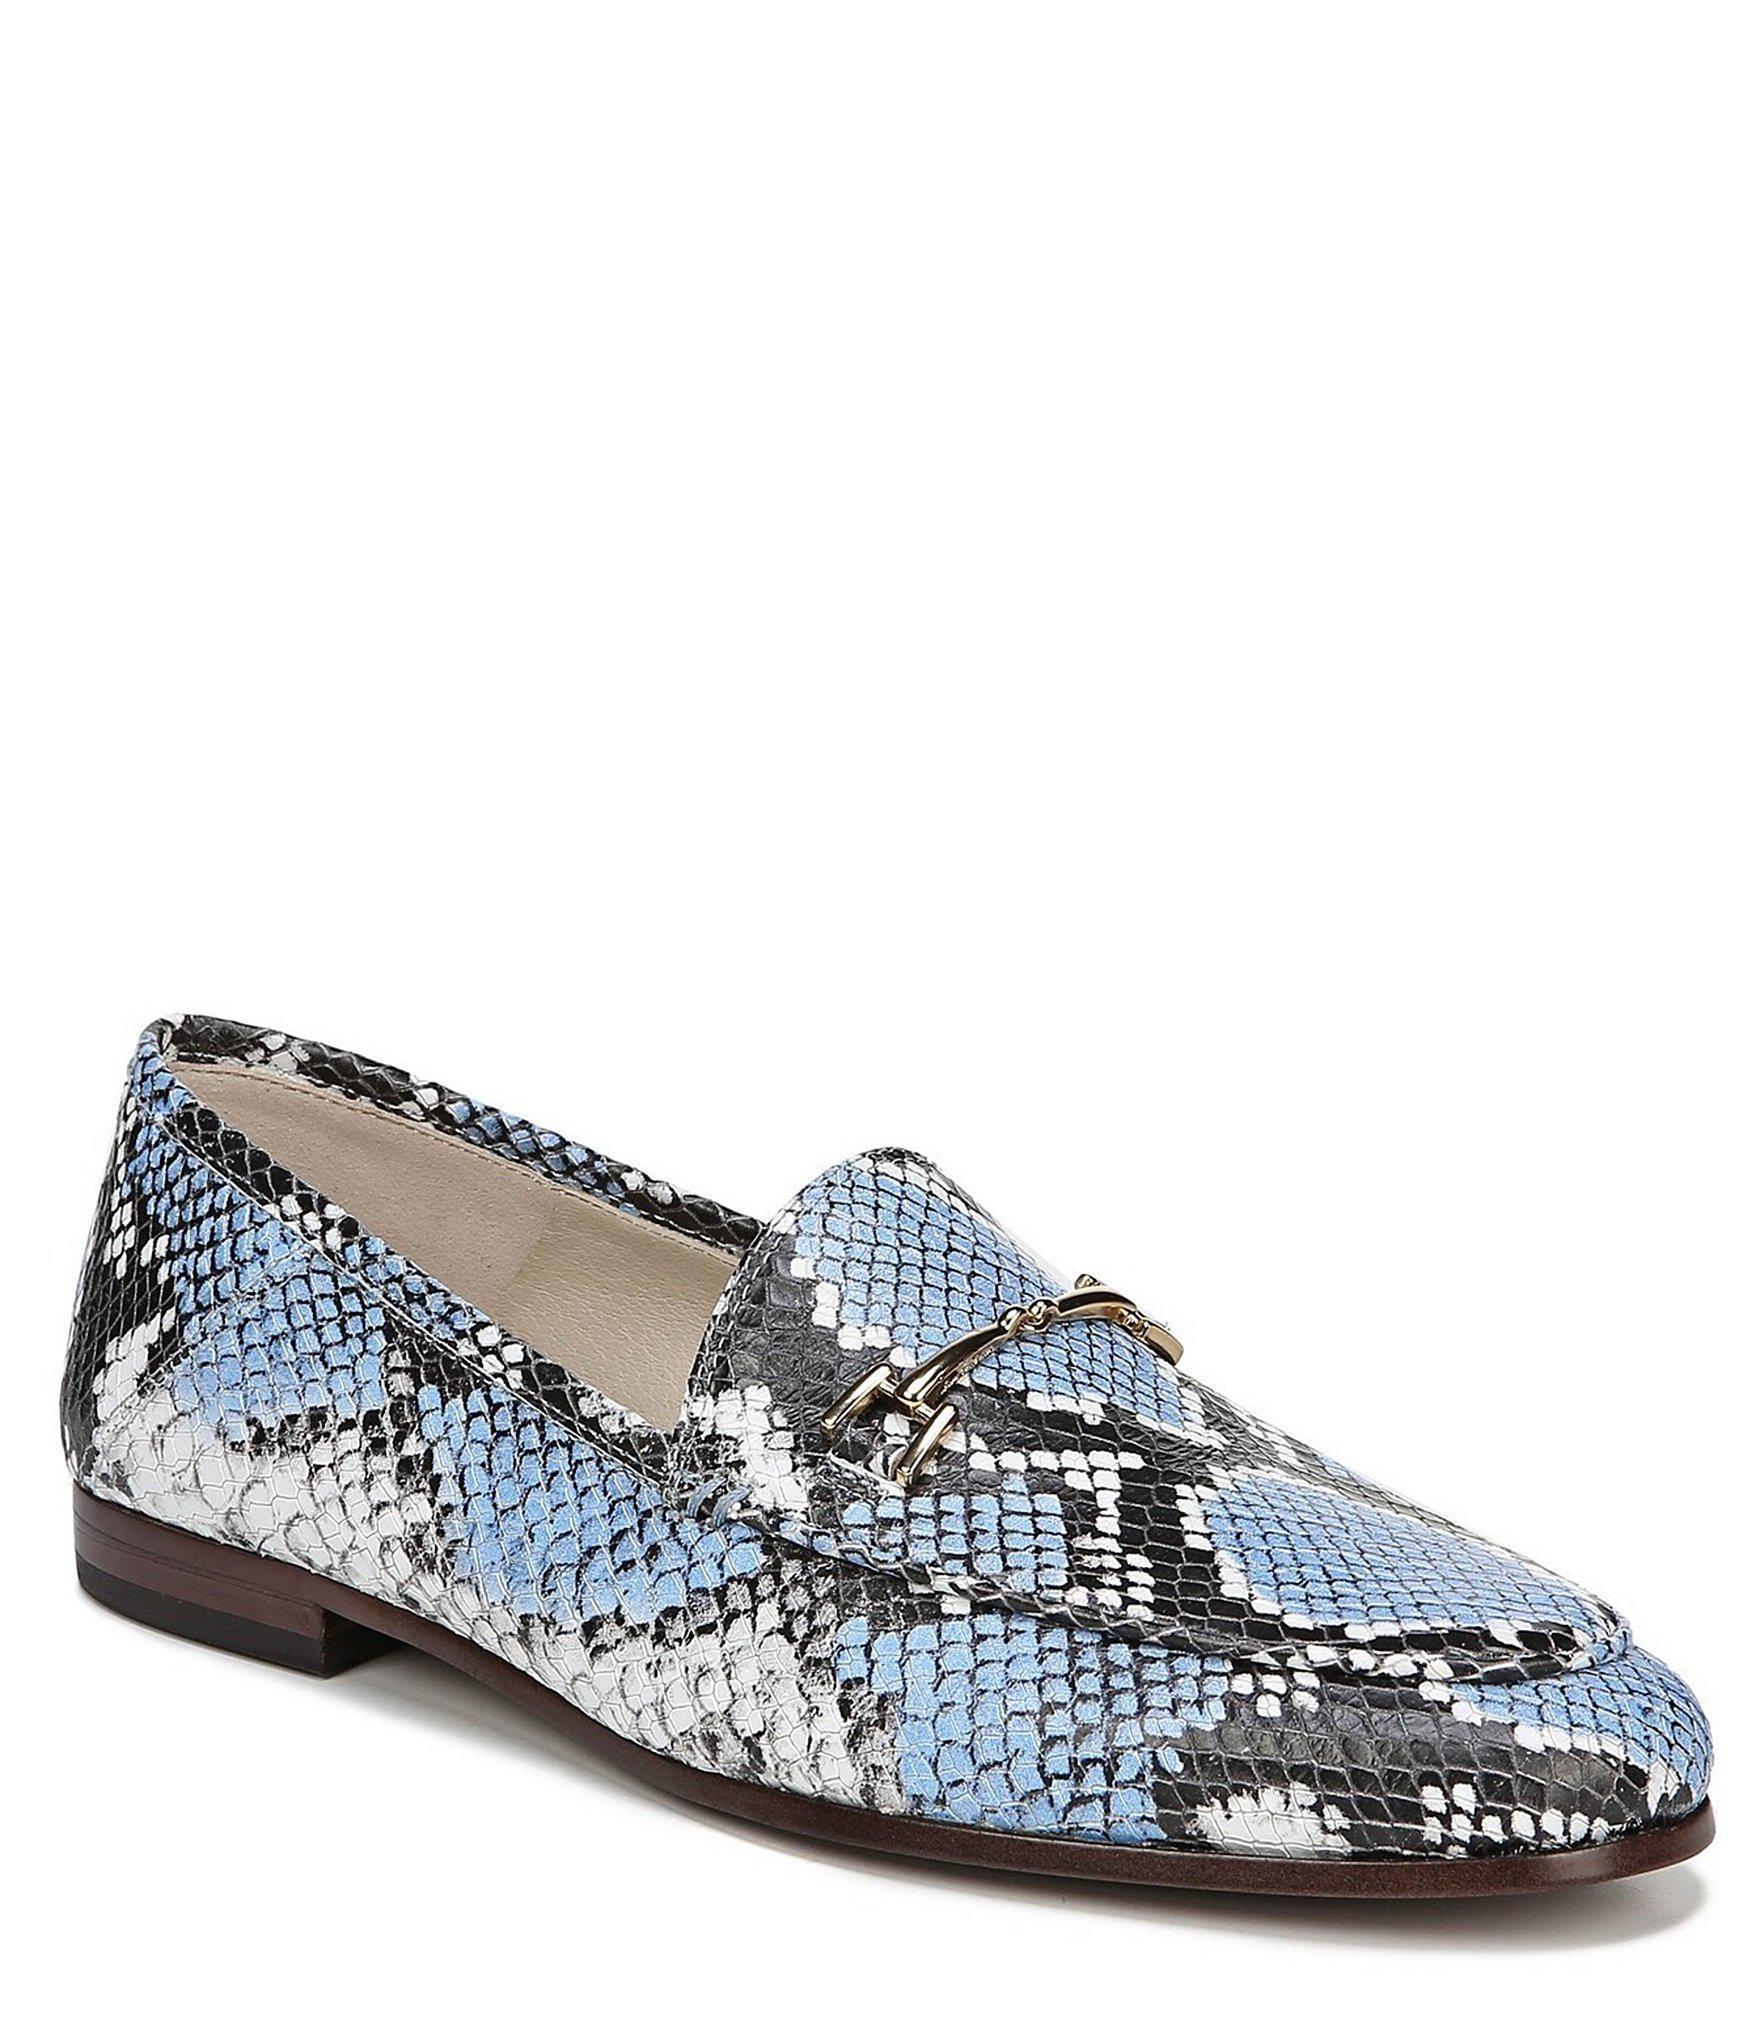 0d696fde4d49 Sam Edelman Loraine Loafers in Blue - Lyst